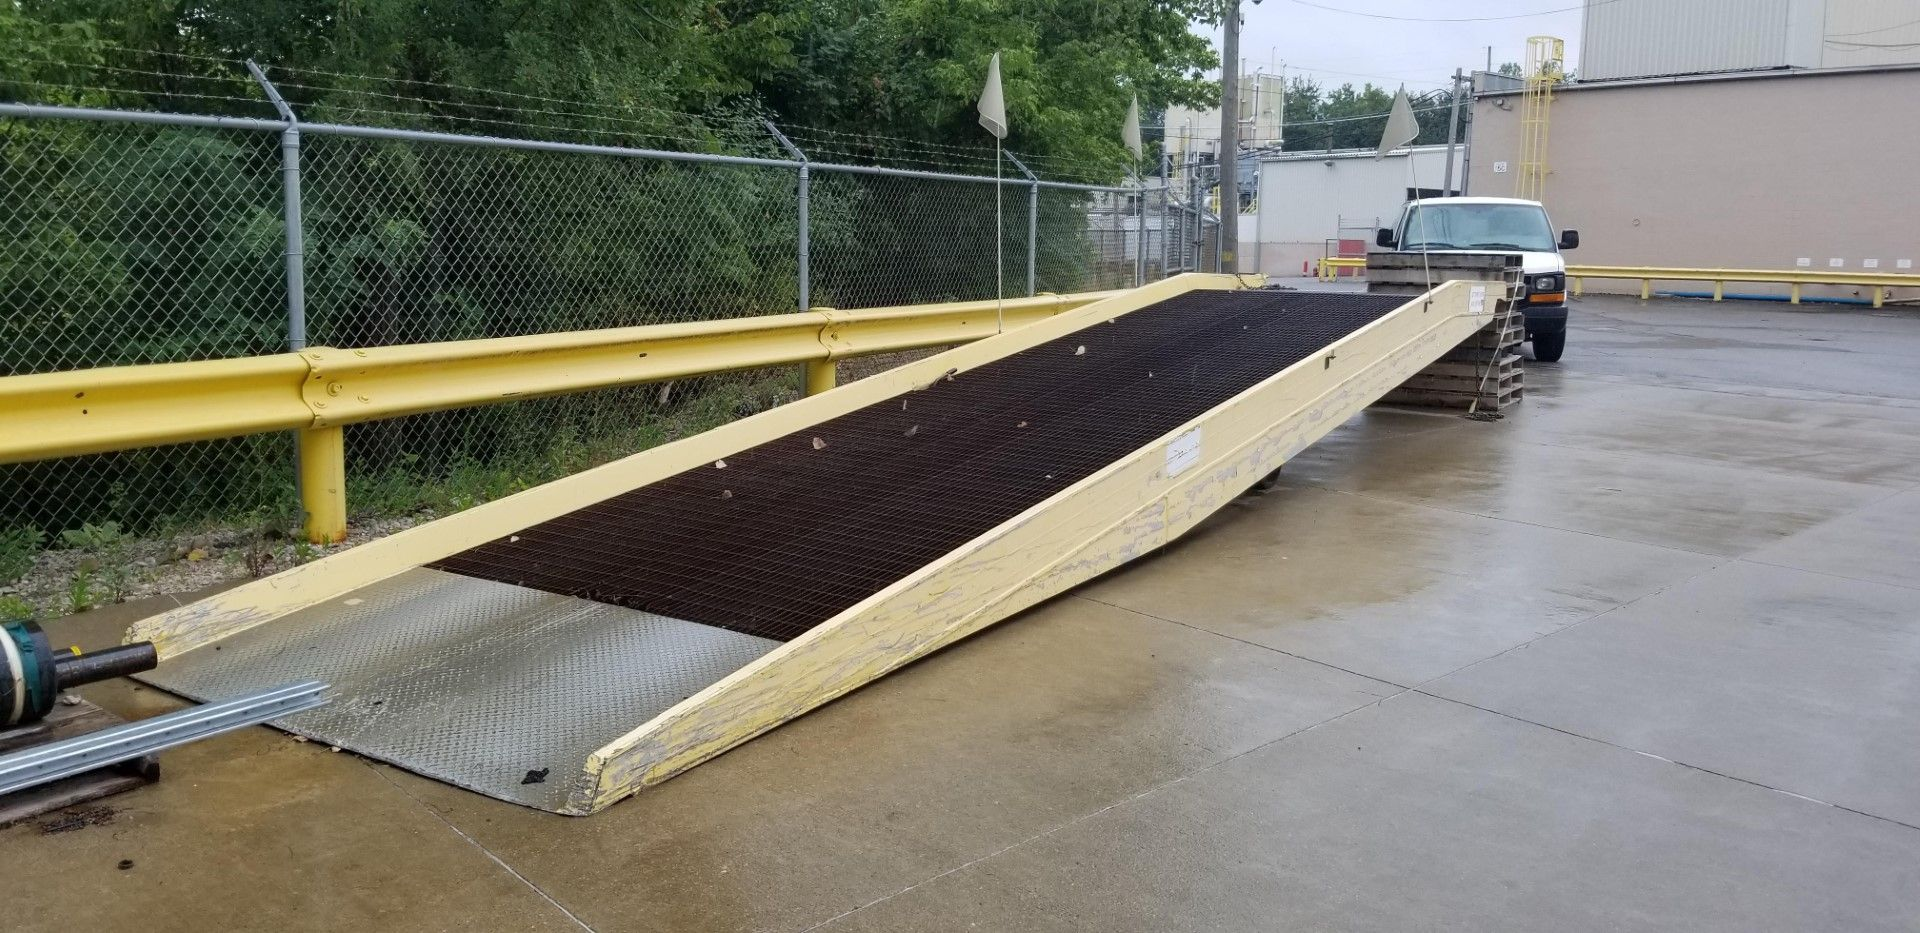 Lot 57 - Heavy Duty Mobile Steel Yard Ramp - 20,000lbs Capacity.